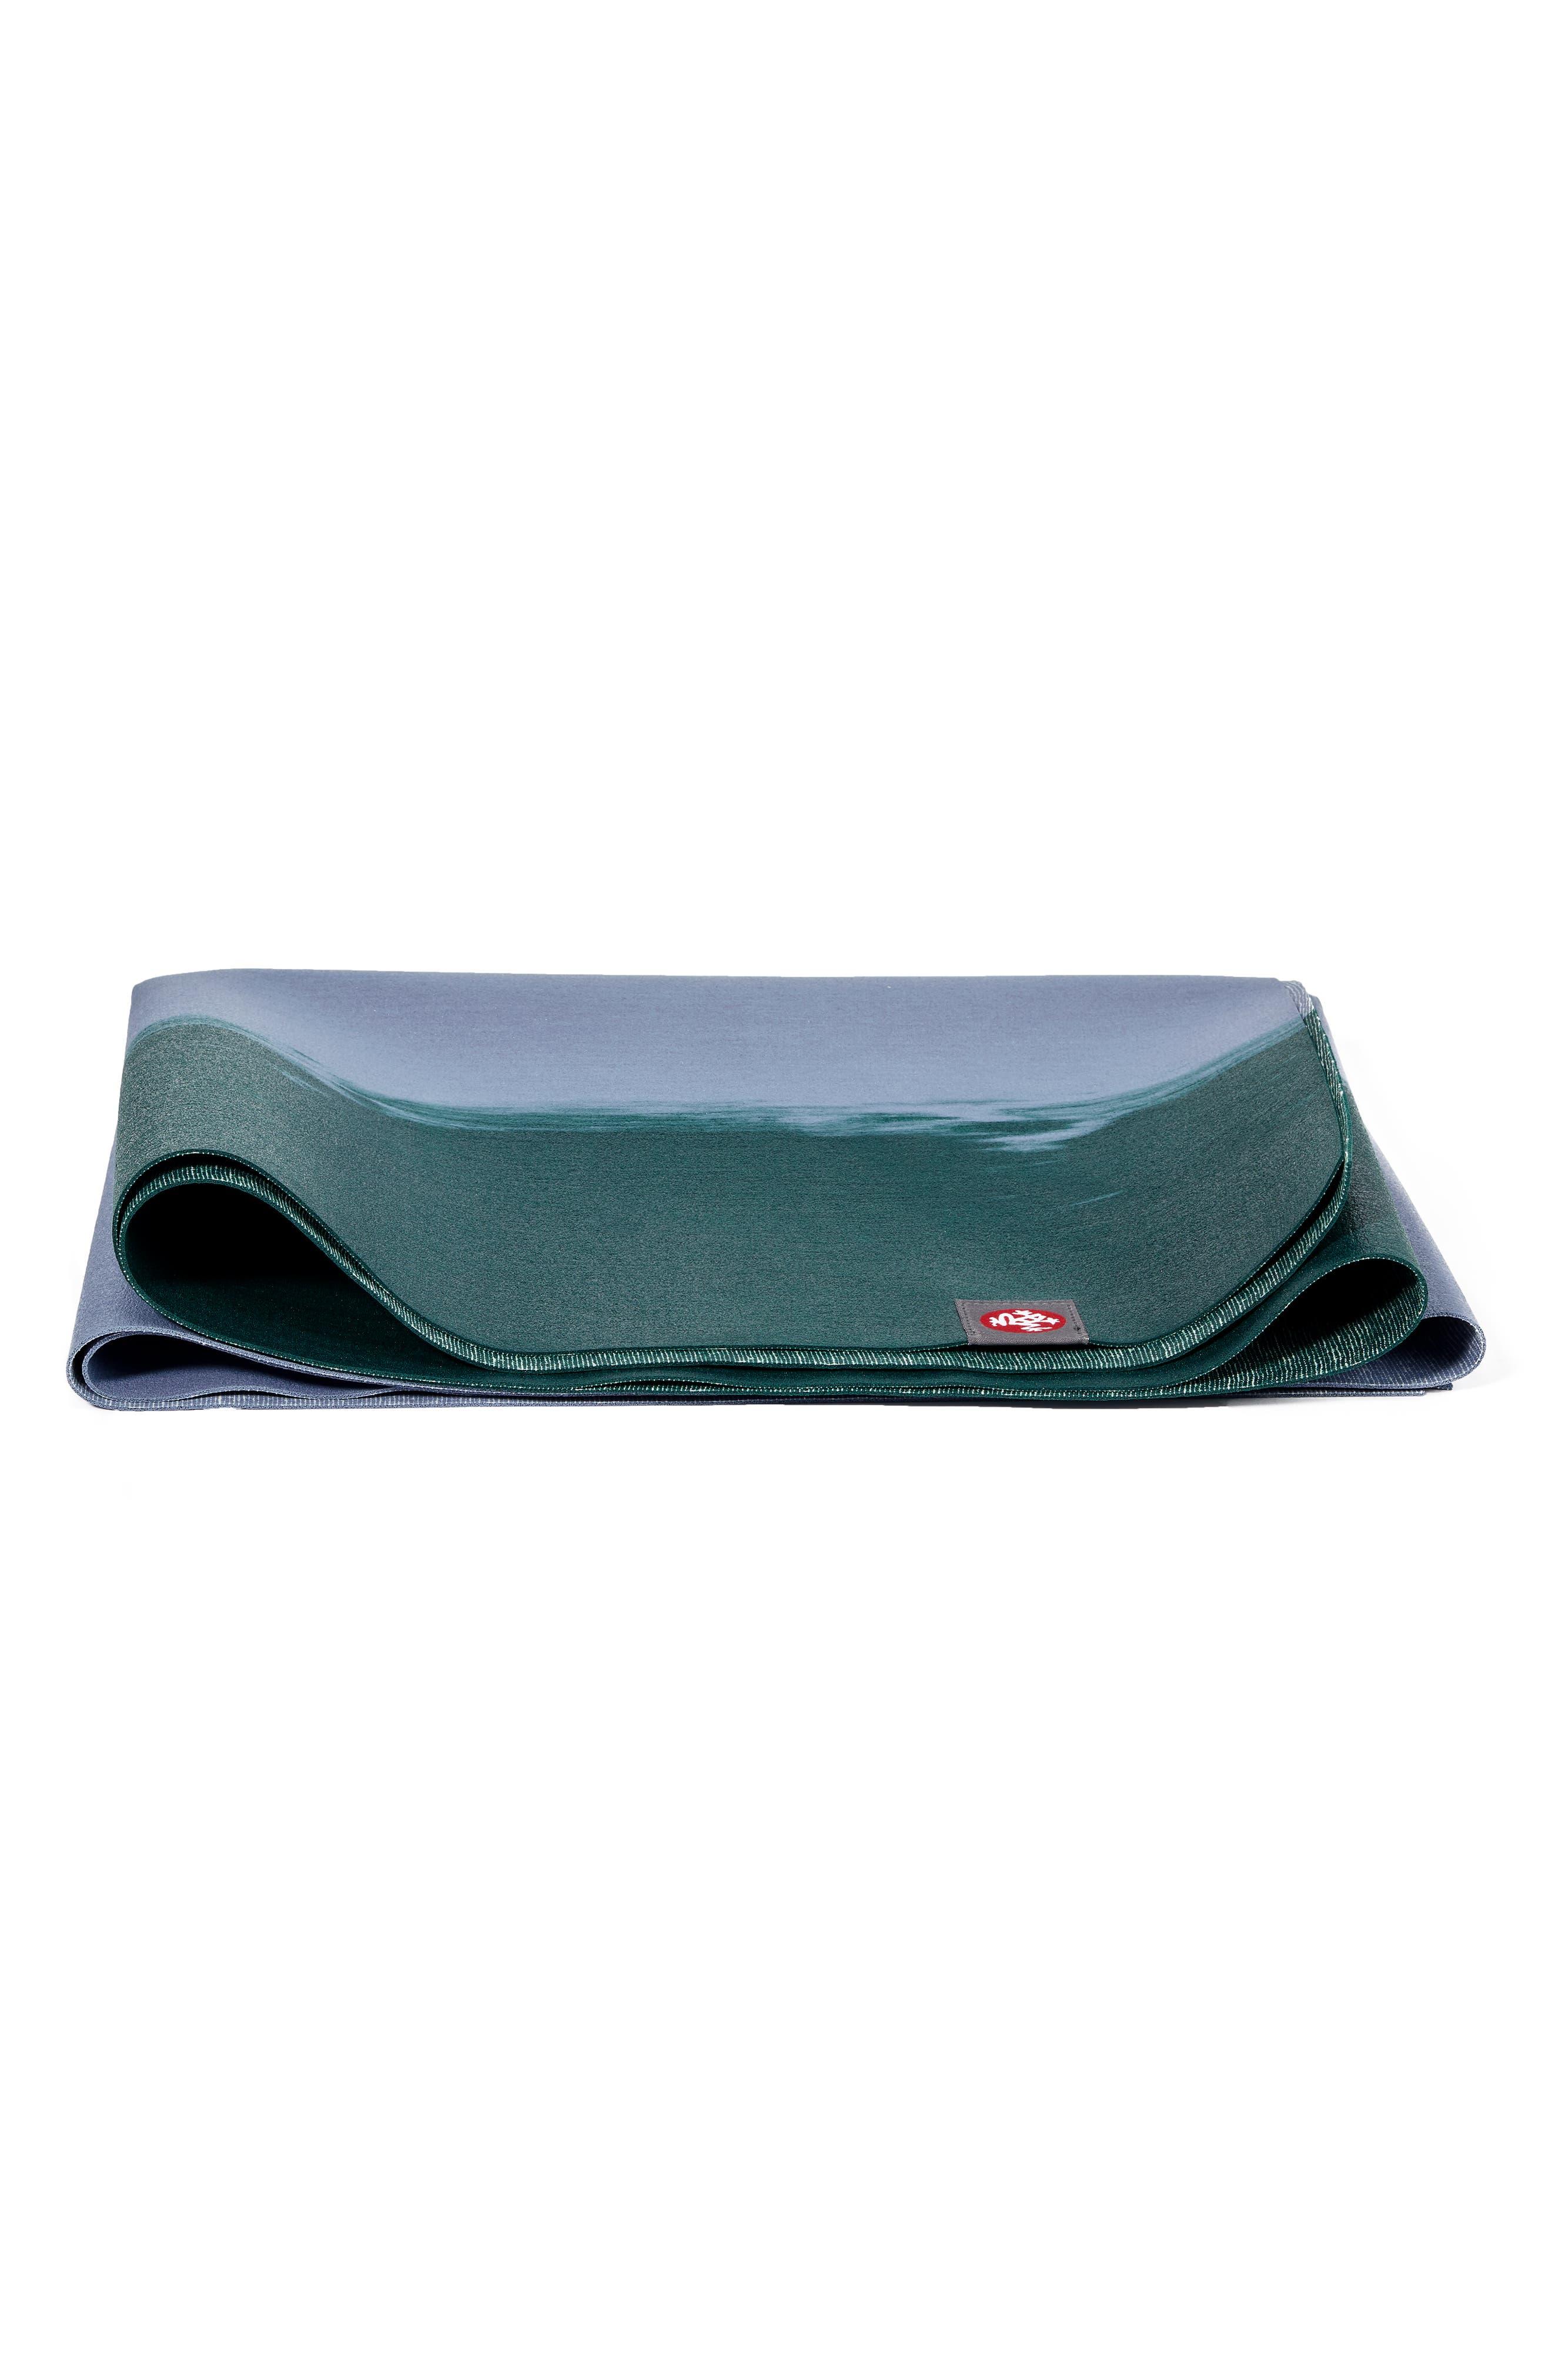 eKO<sup>®</sup> Superlite Yoga Mat,                             Alternate thumbnail 4, color,                             230